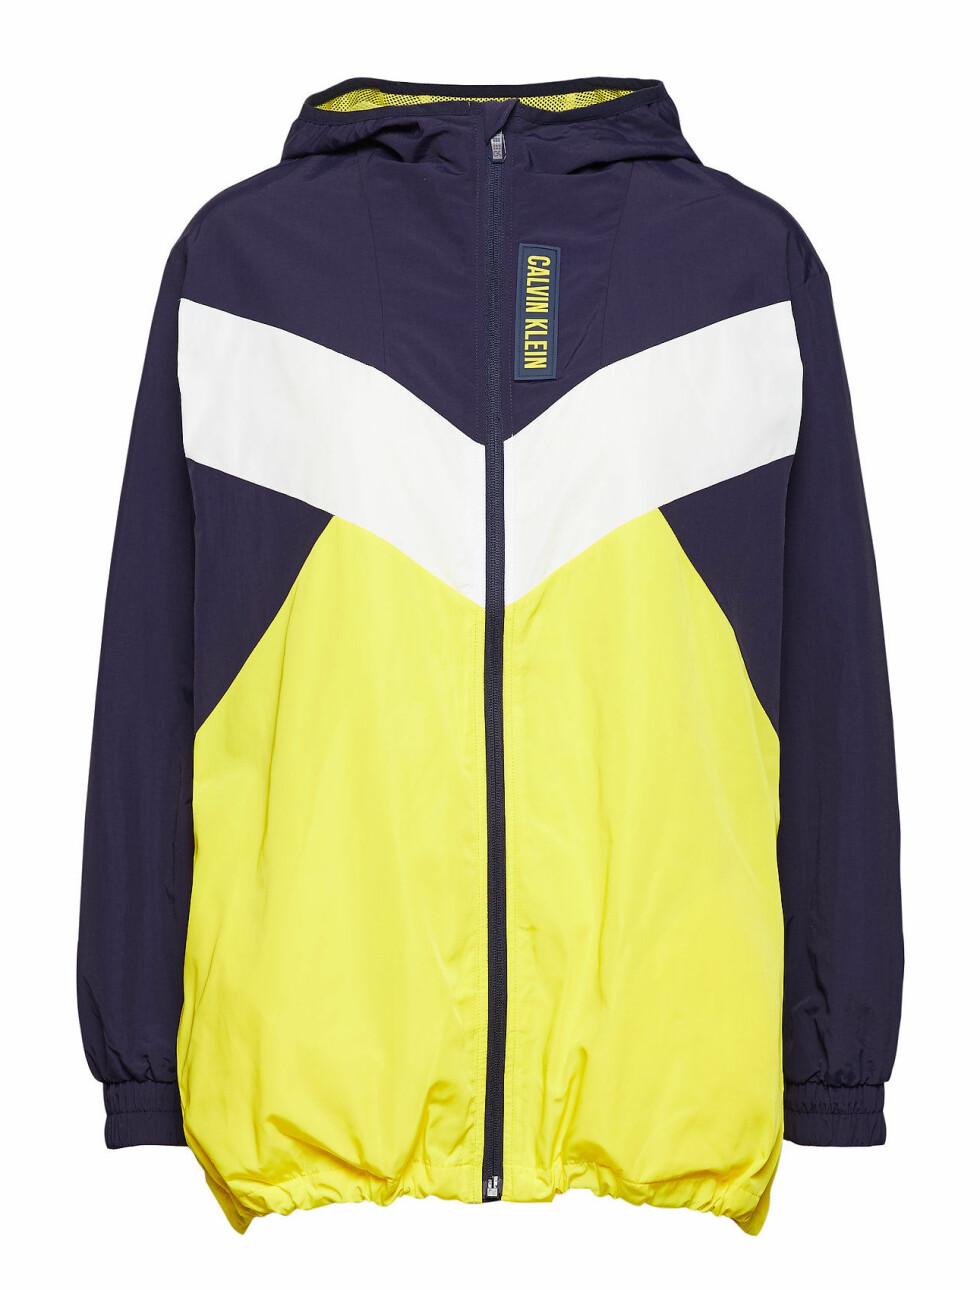 Jakke fra Calvin Klein |1500,-| https://www.boozt.com/no/no/calvin-klein-performance/woven-jacket-cb_18150818/18150822?navId=67746&group=listing&position=1000000